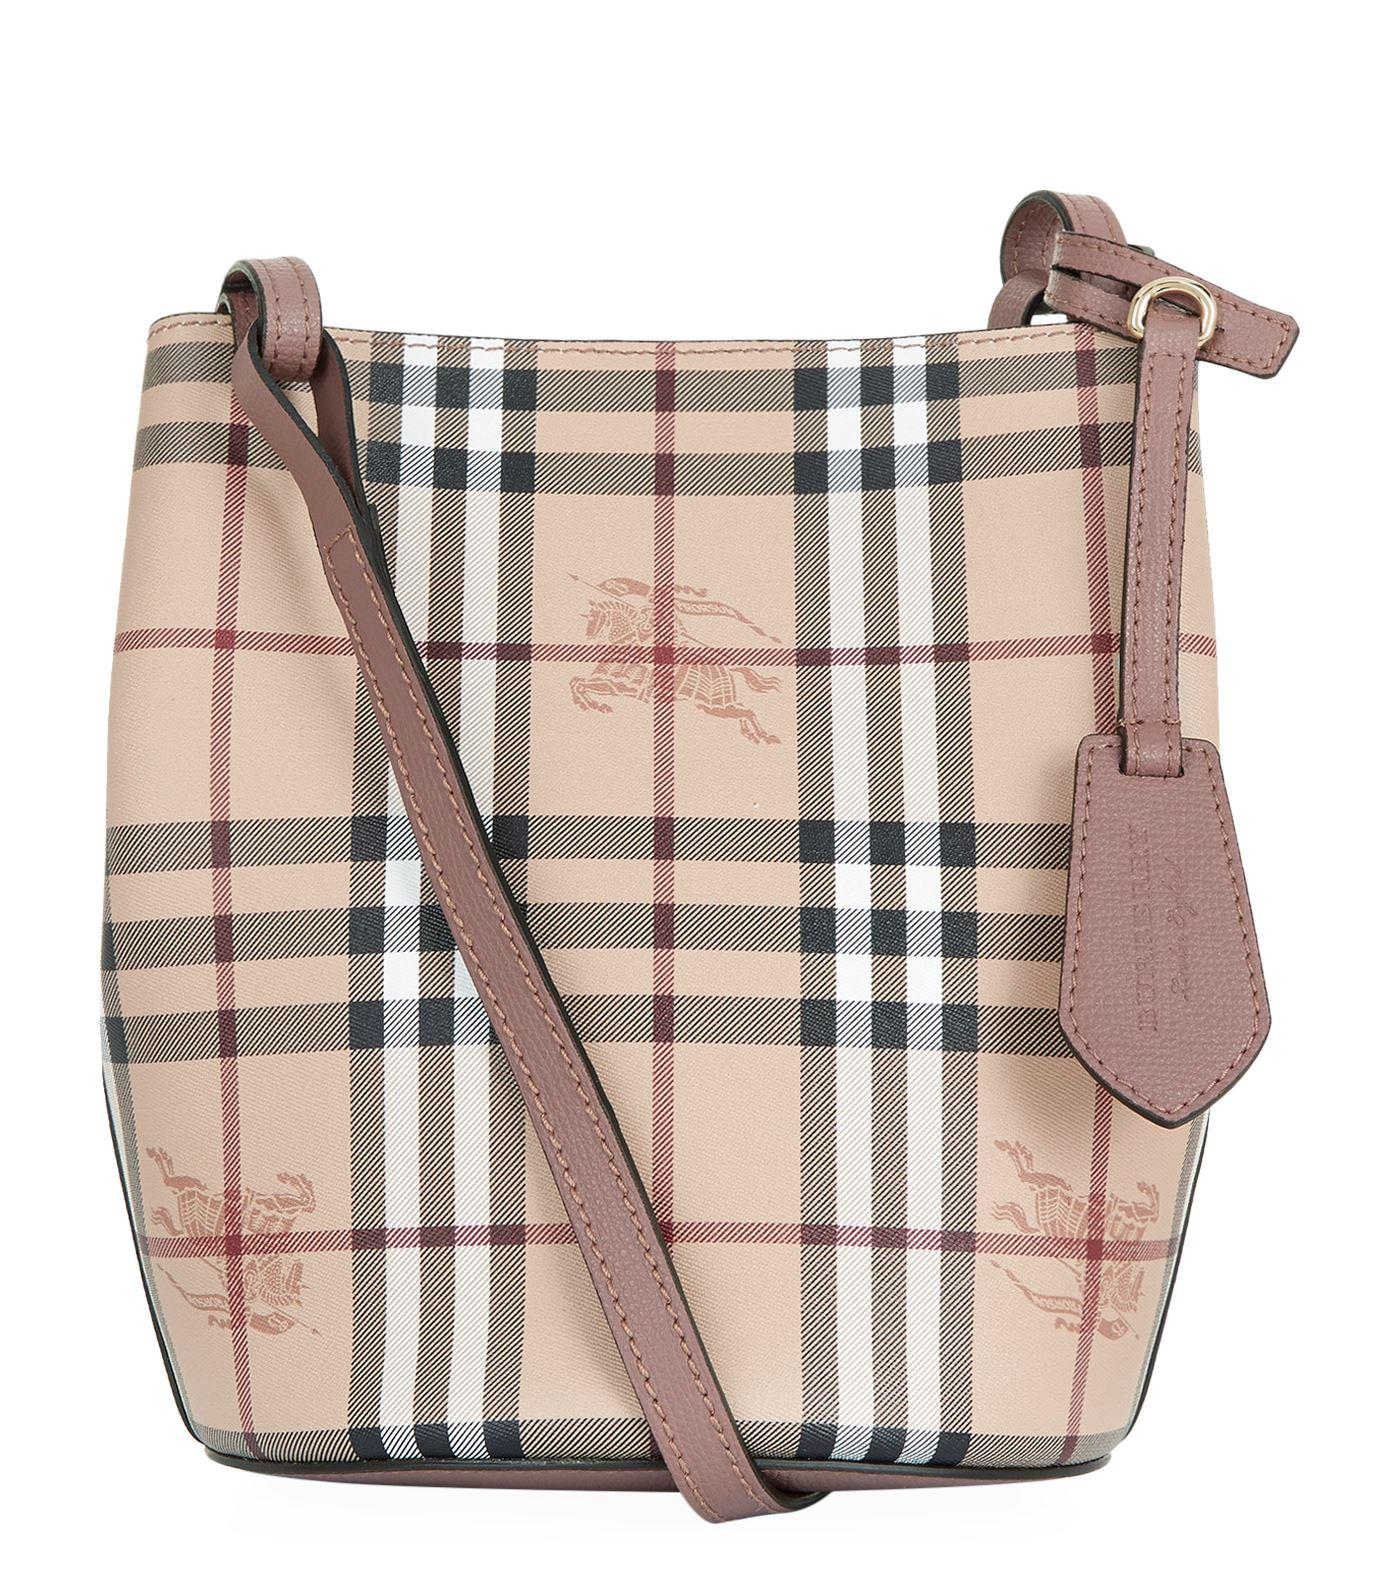 507a72a4c93f Burberry Small Lorne Bucket Bag in Purple - Lyst